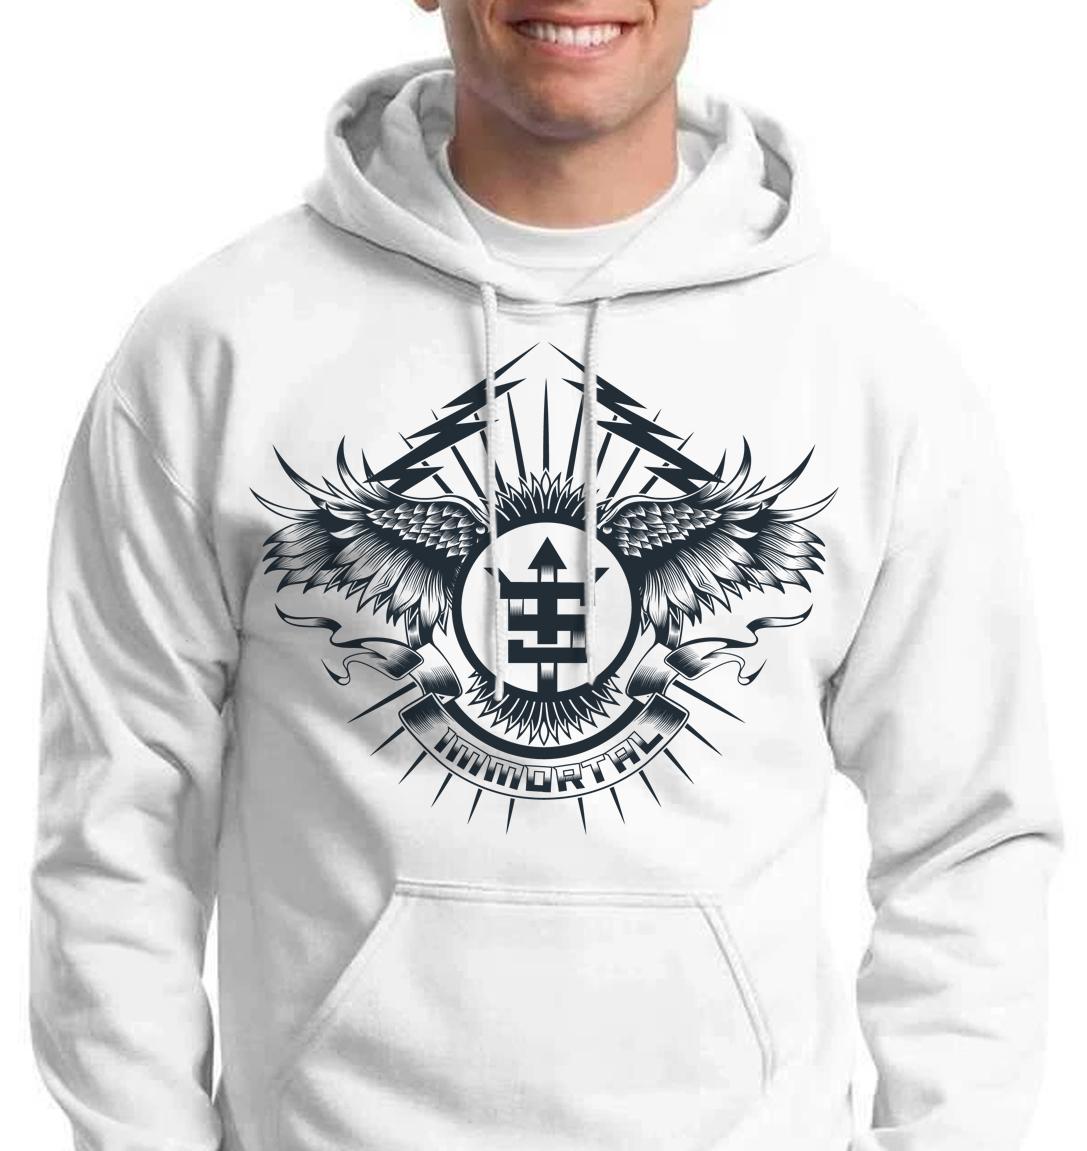 Winning Entry #15 for T-Shirt Design contest - ImmortalSupplyCo Marketing T-Shirt Design required - original